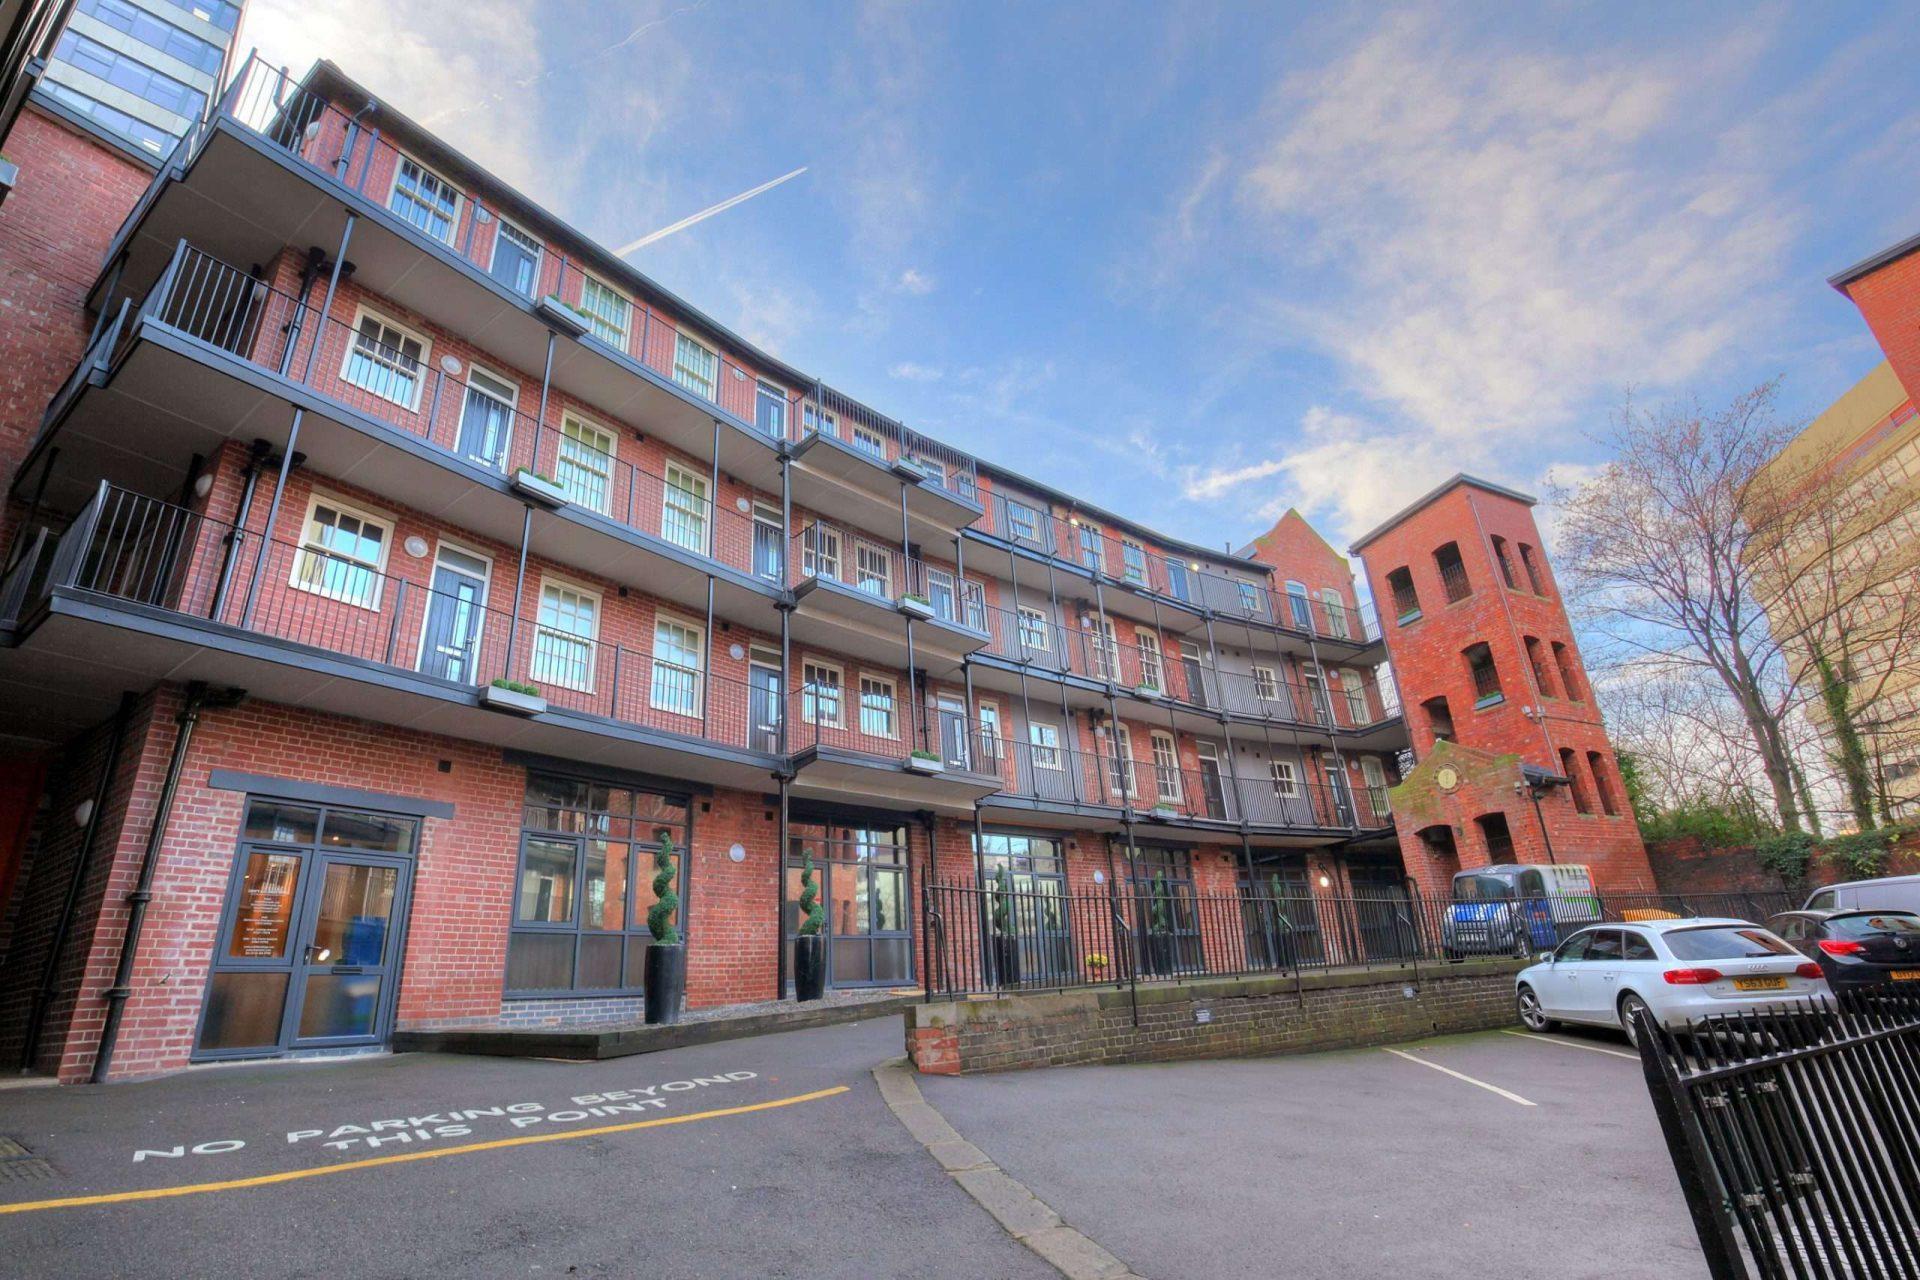 Flat_21_Croft_Buildings